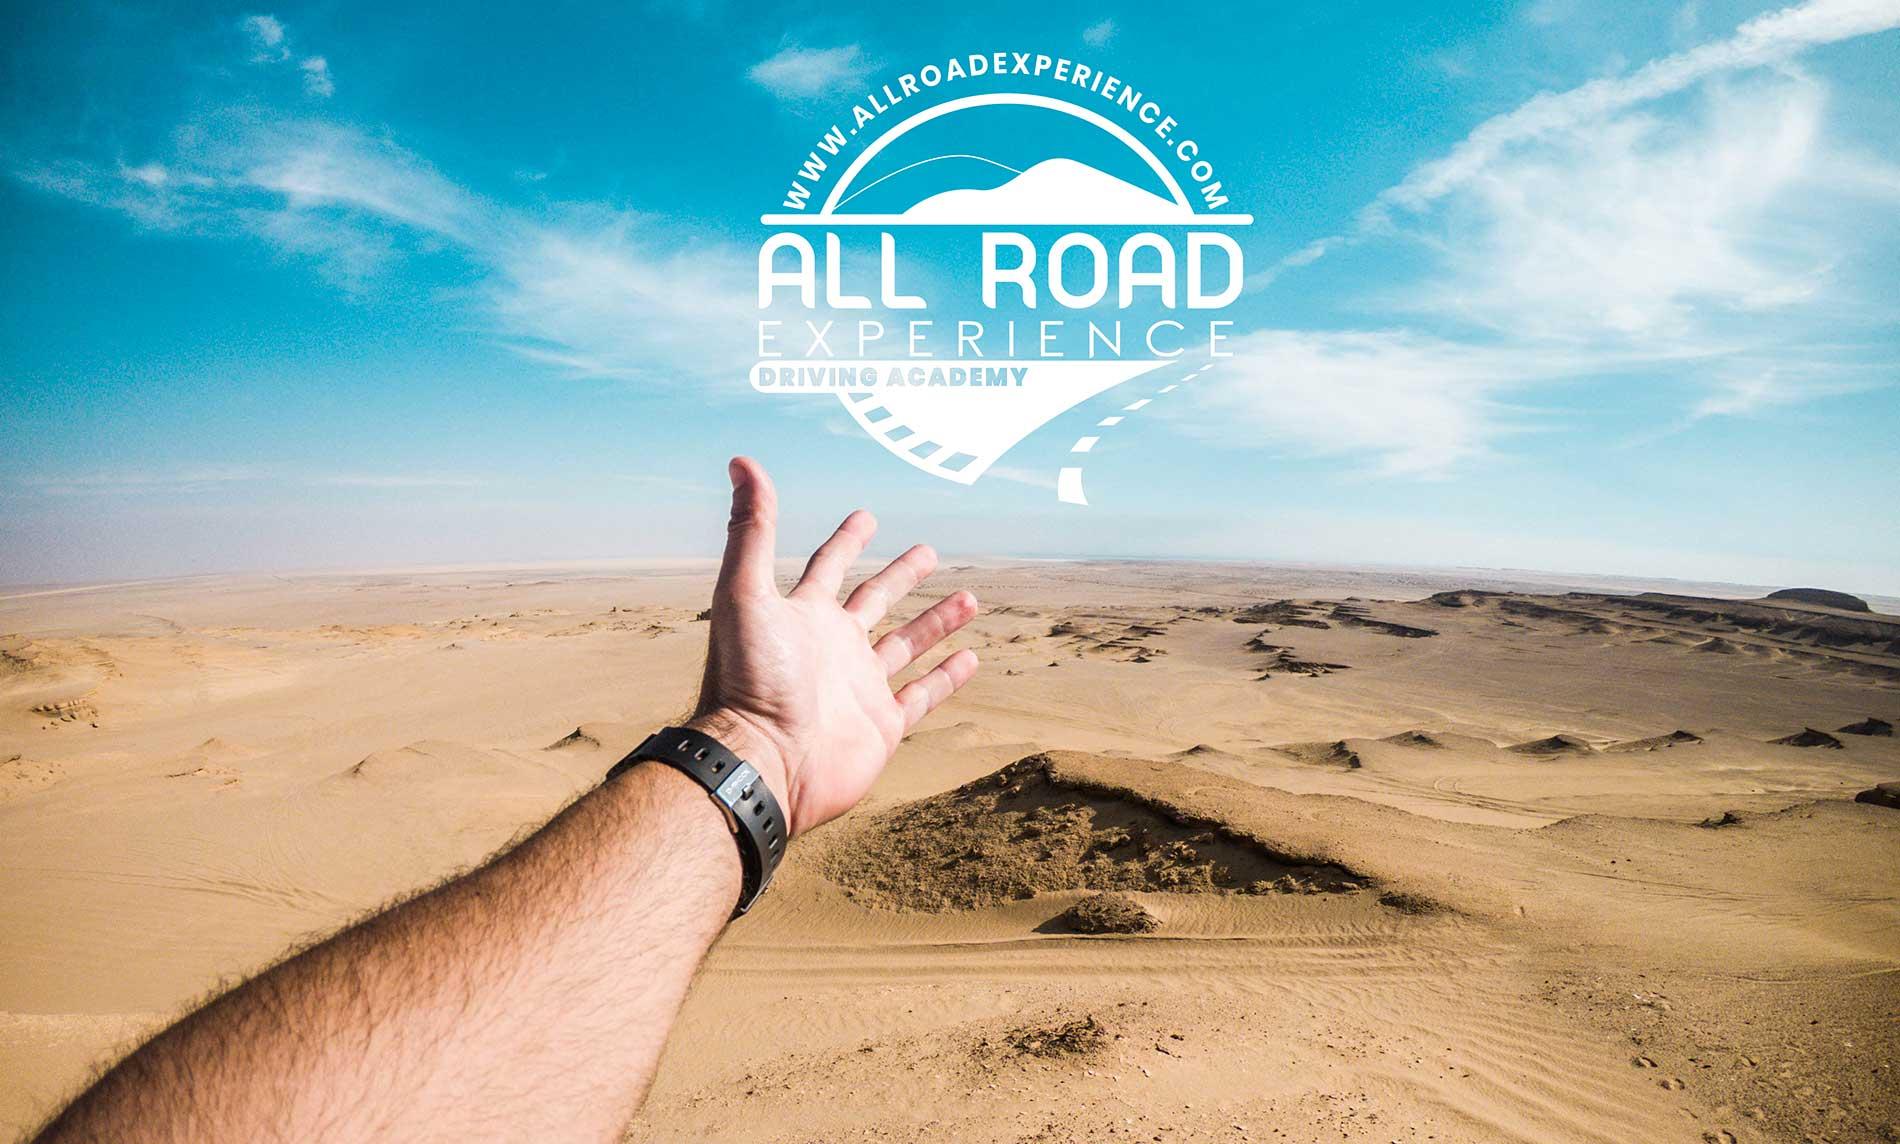 desert-main-voyage-logo-allroadexperience-ralley-academy-conduite-4x4